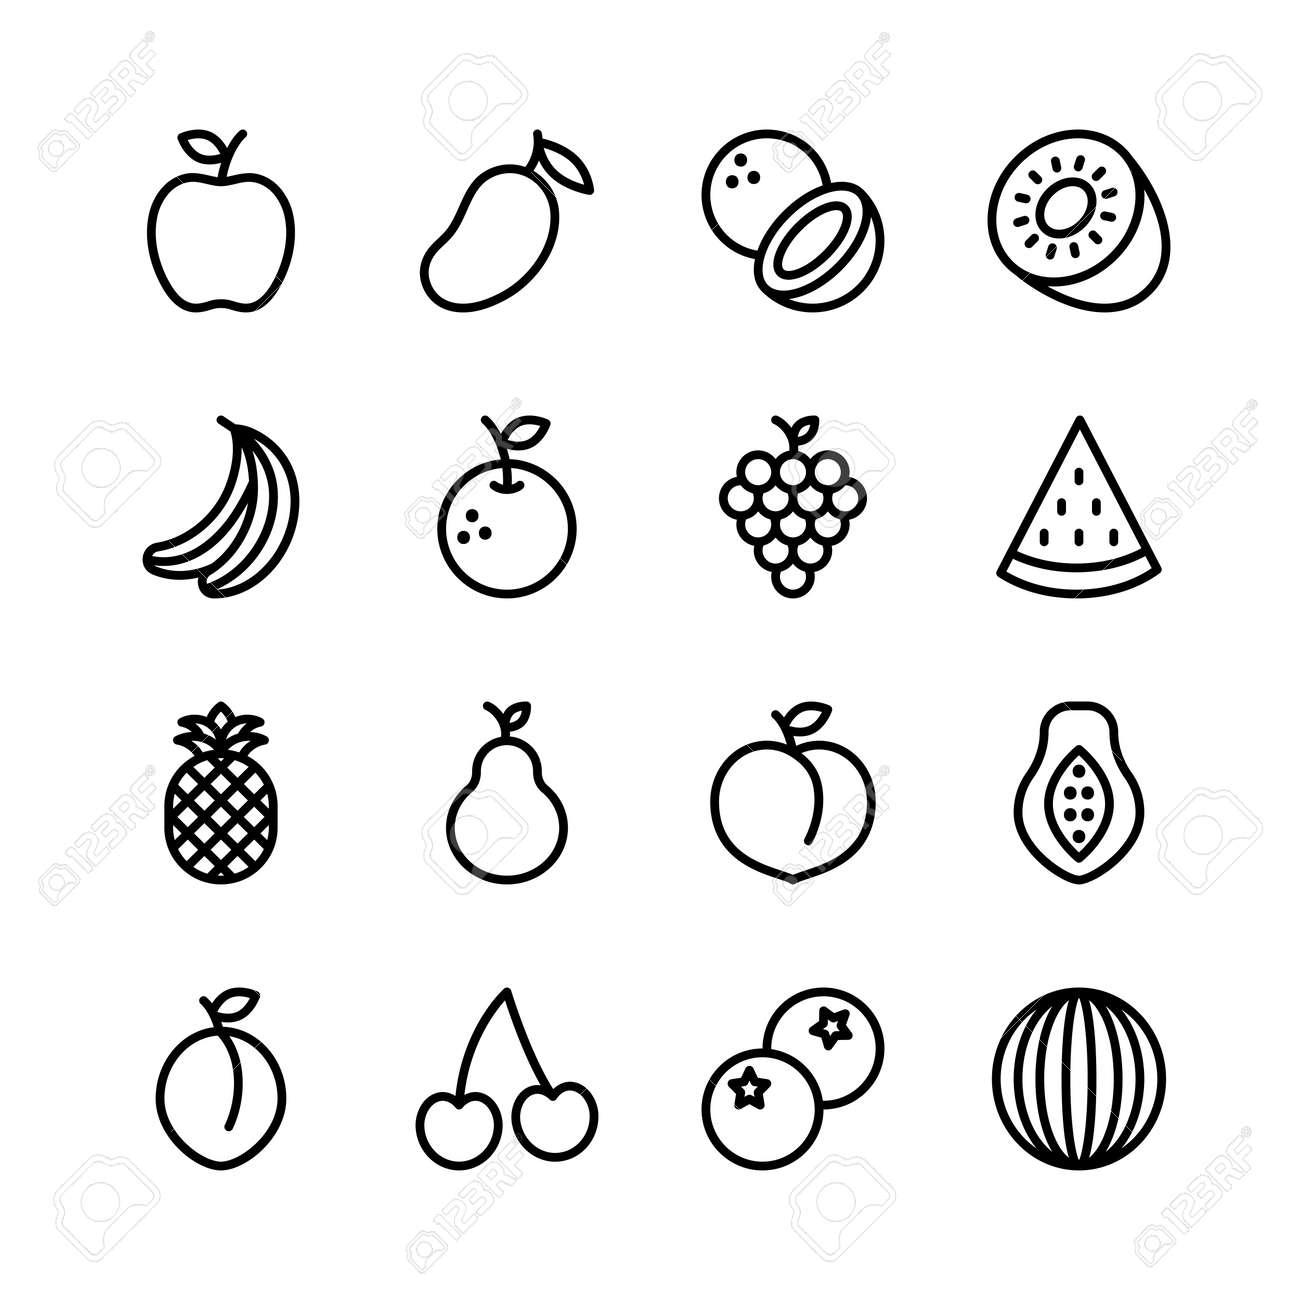 Fruit line icons set, outline style. Vector illustration - 155846140